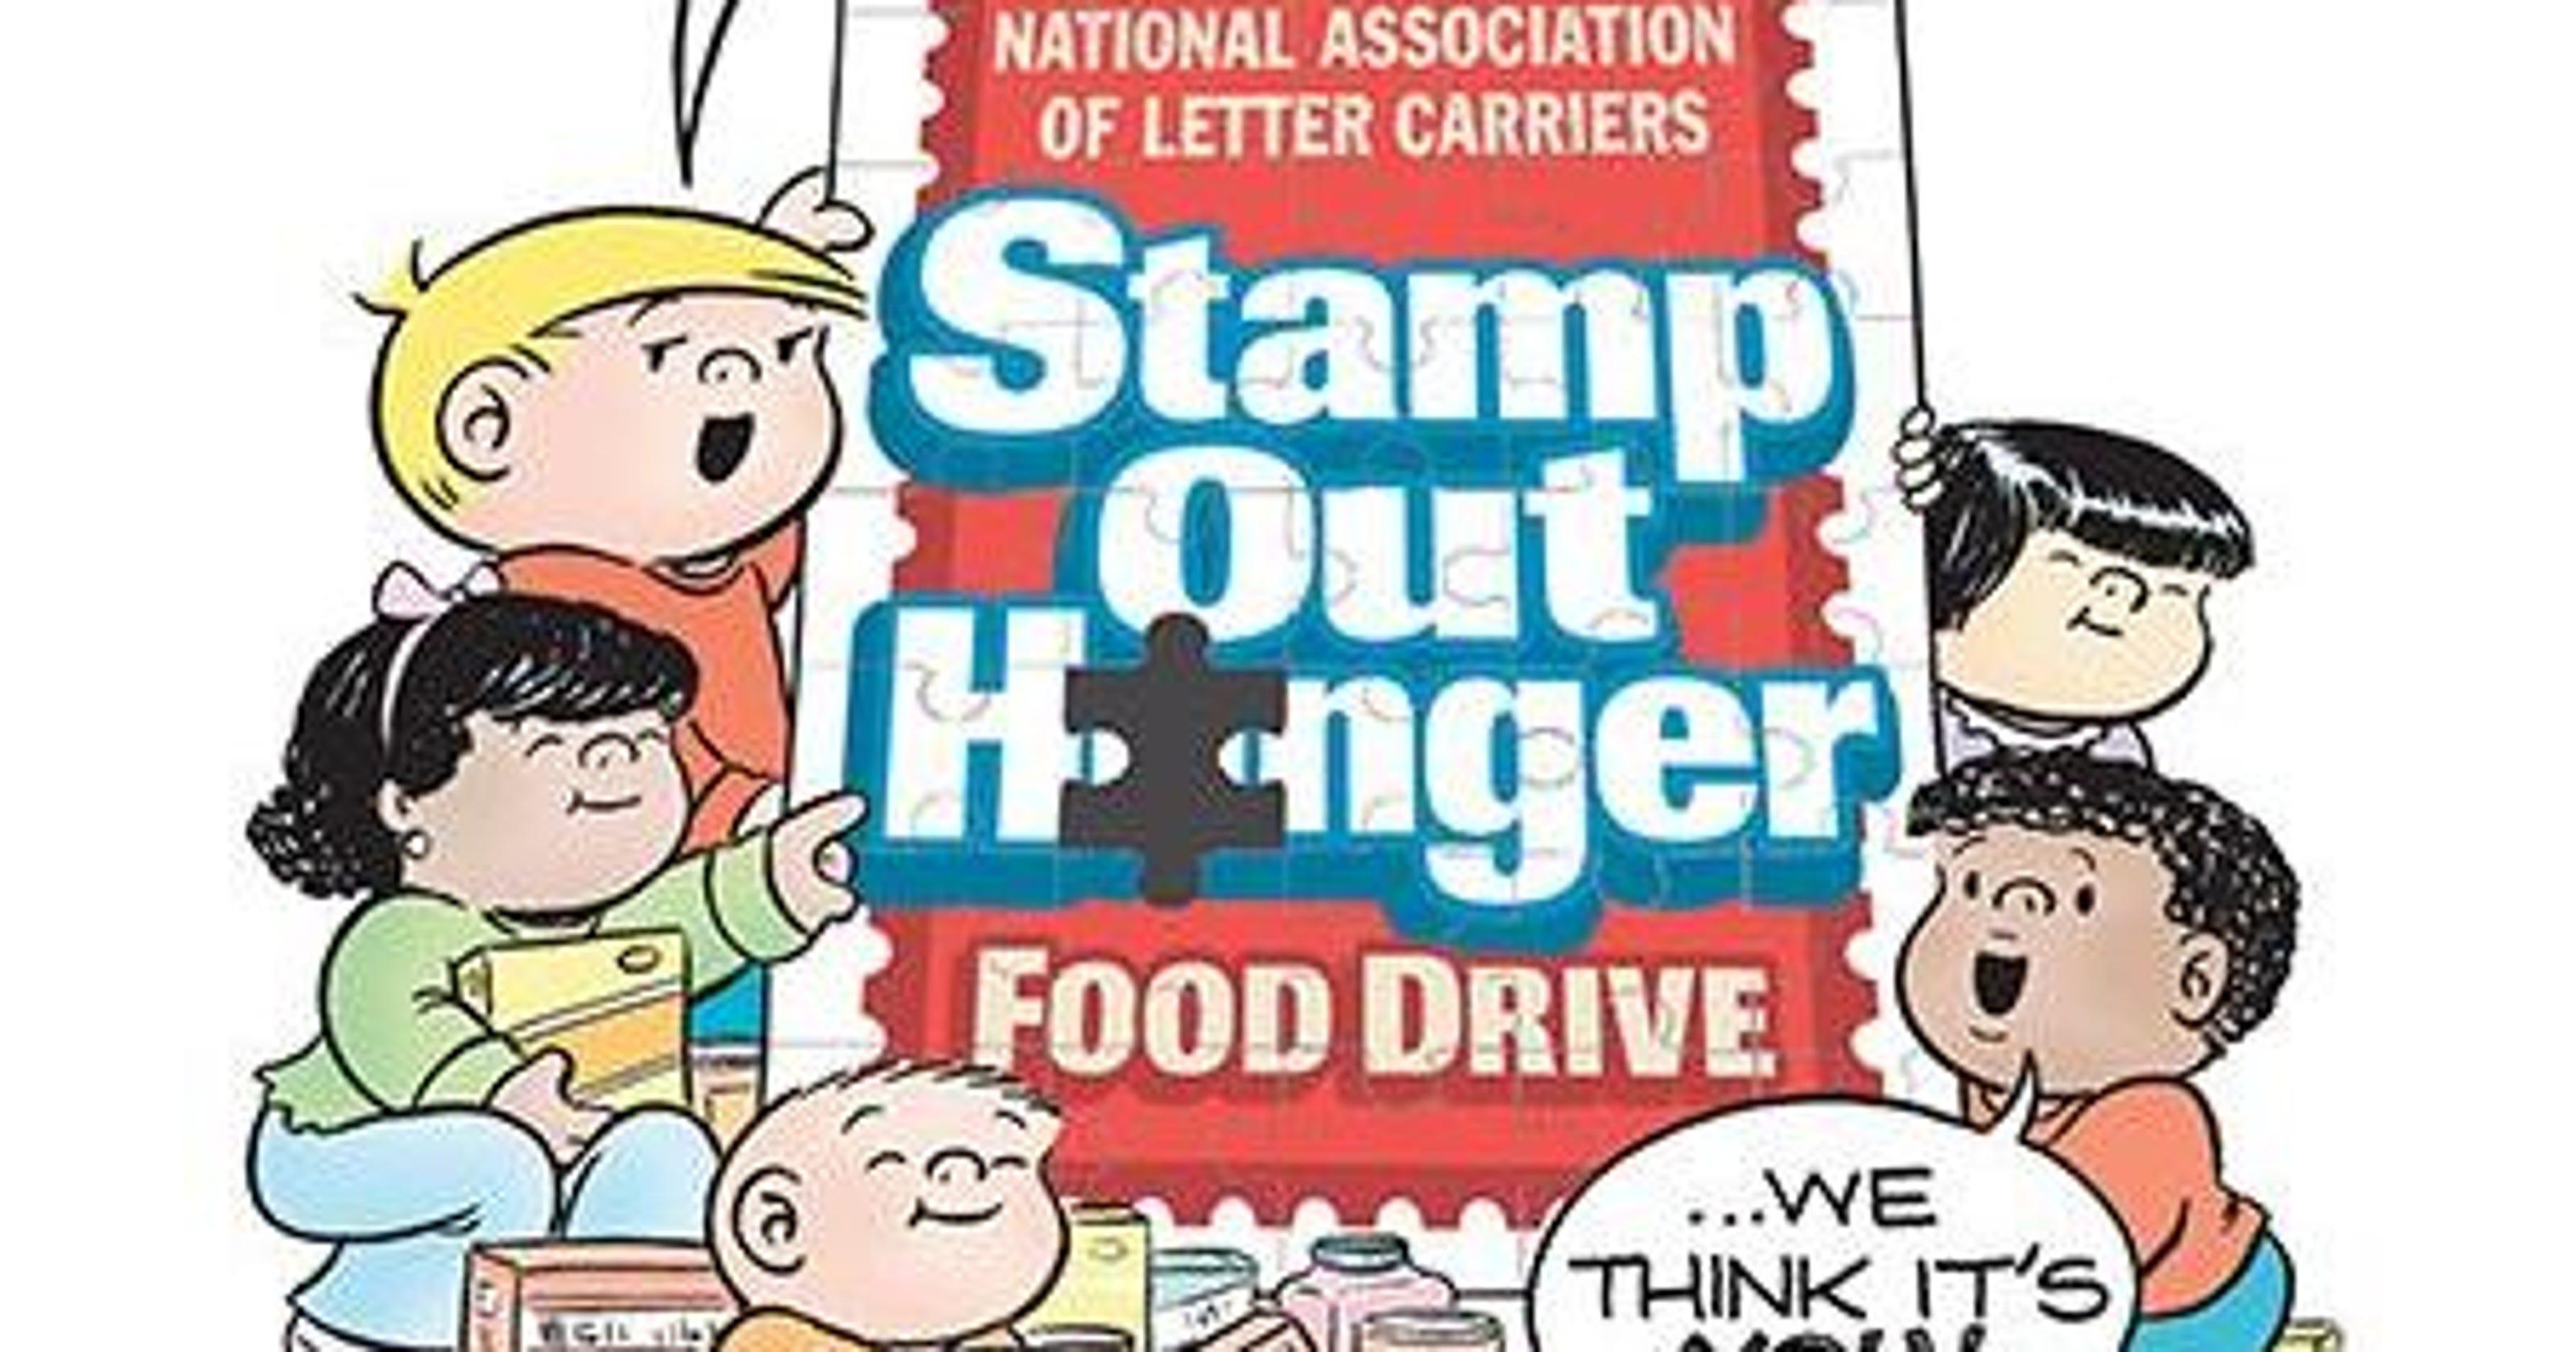 Peanut butter & oatmeal for urban ministries clipart clip art transparent Postal food drive set for Saturday clip art transparent